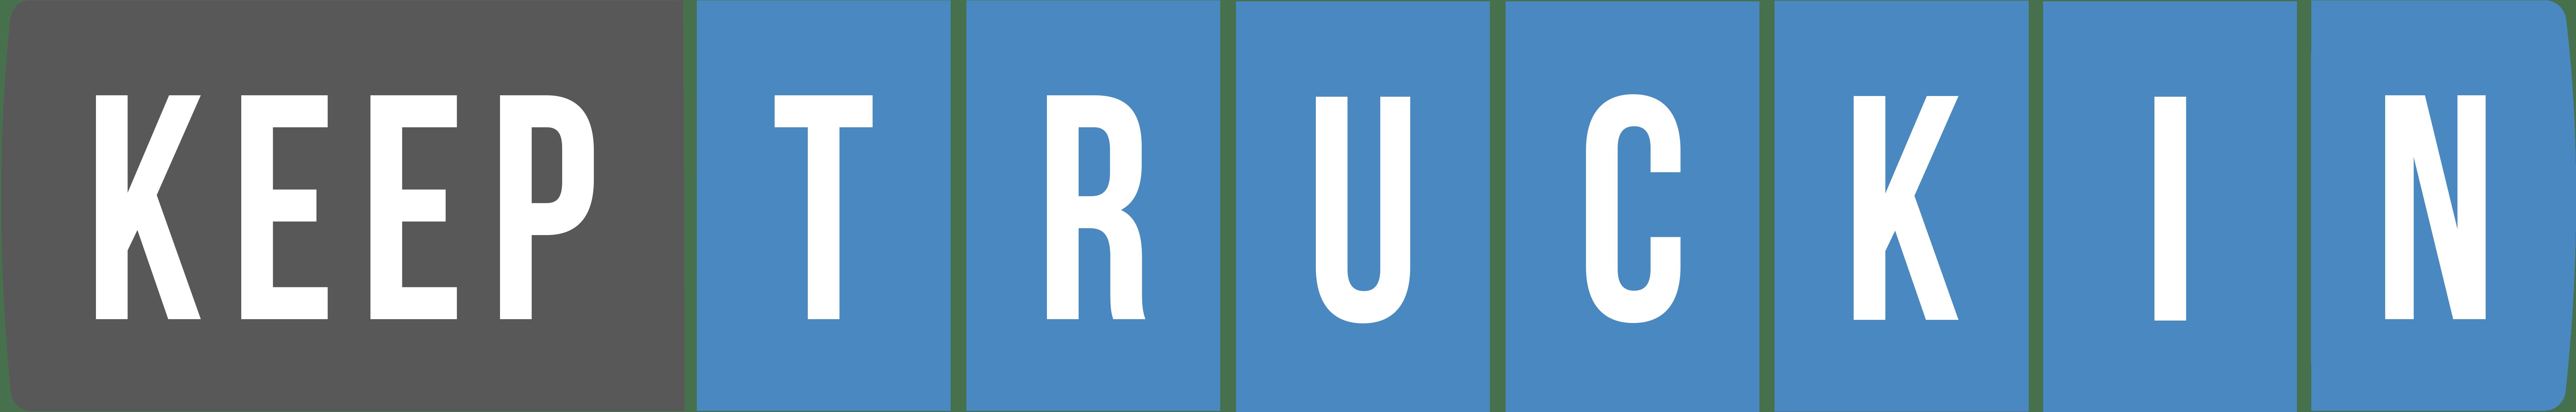 KeepTruckin company logo